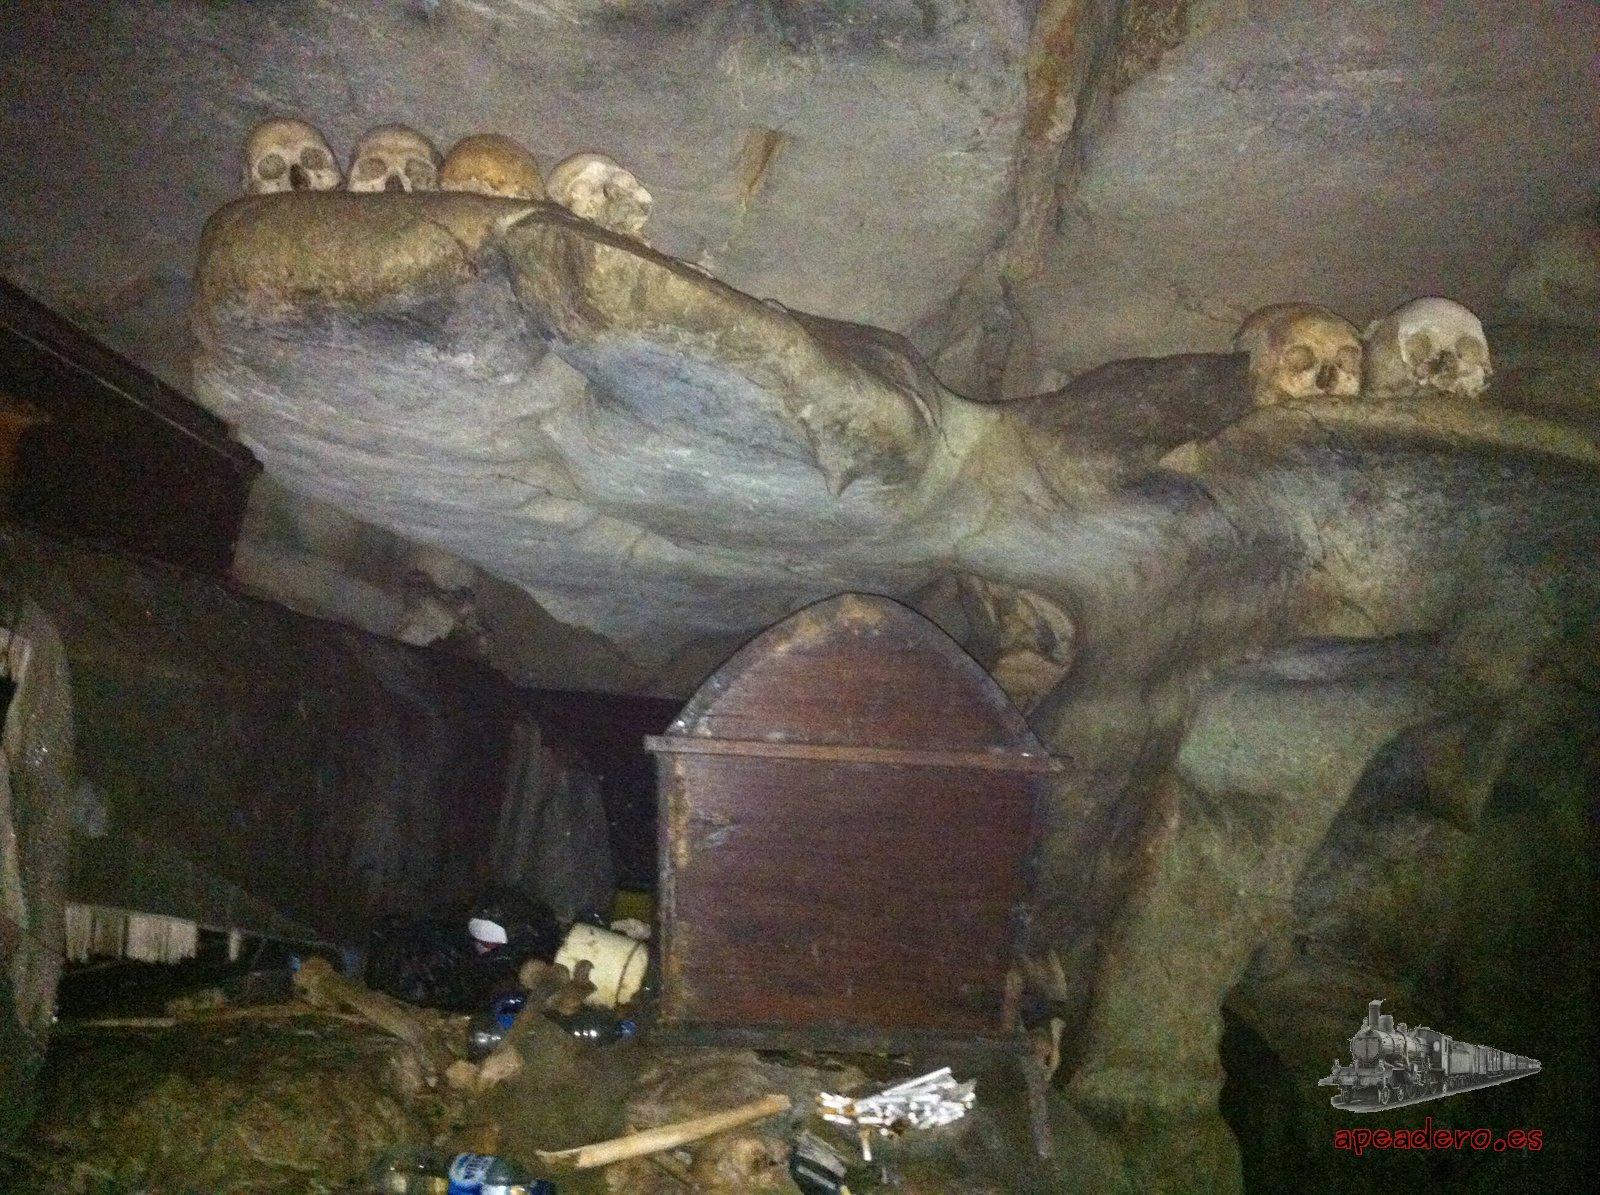 Tana Toraja: muertos y funerales